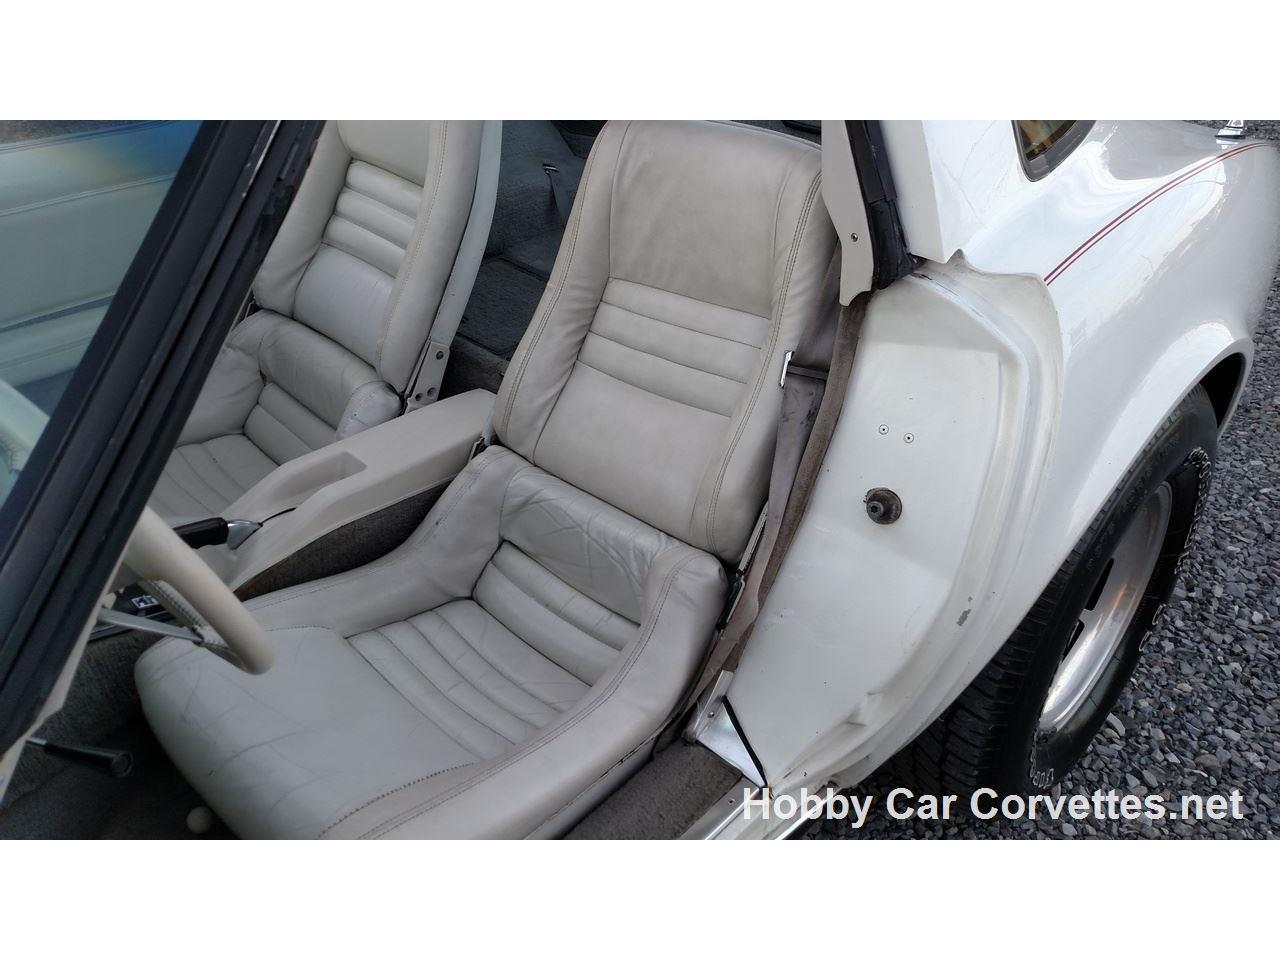 Large Picture of '79 Corvette - $14,999.00 - KMMI